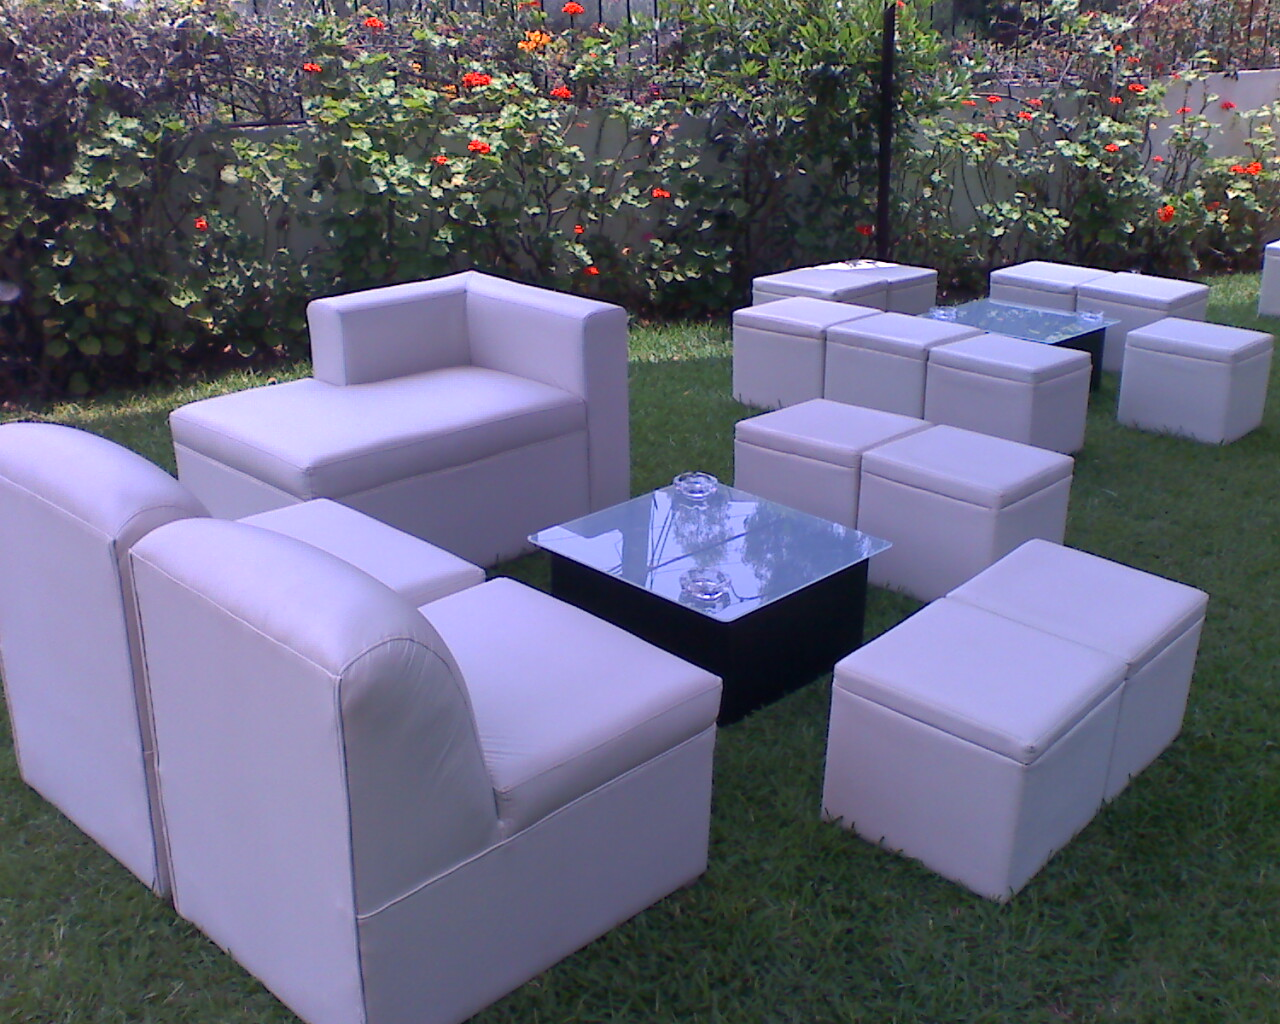 De gala lounge bar alquiler muebles lounge mobiliario for Muebles para bar lounge